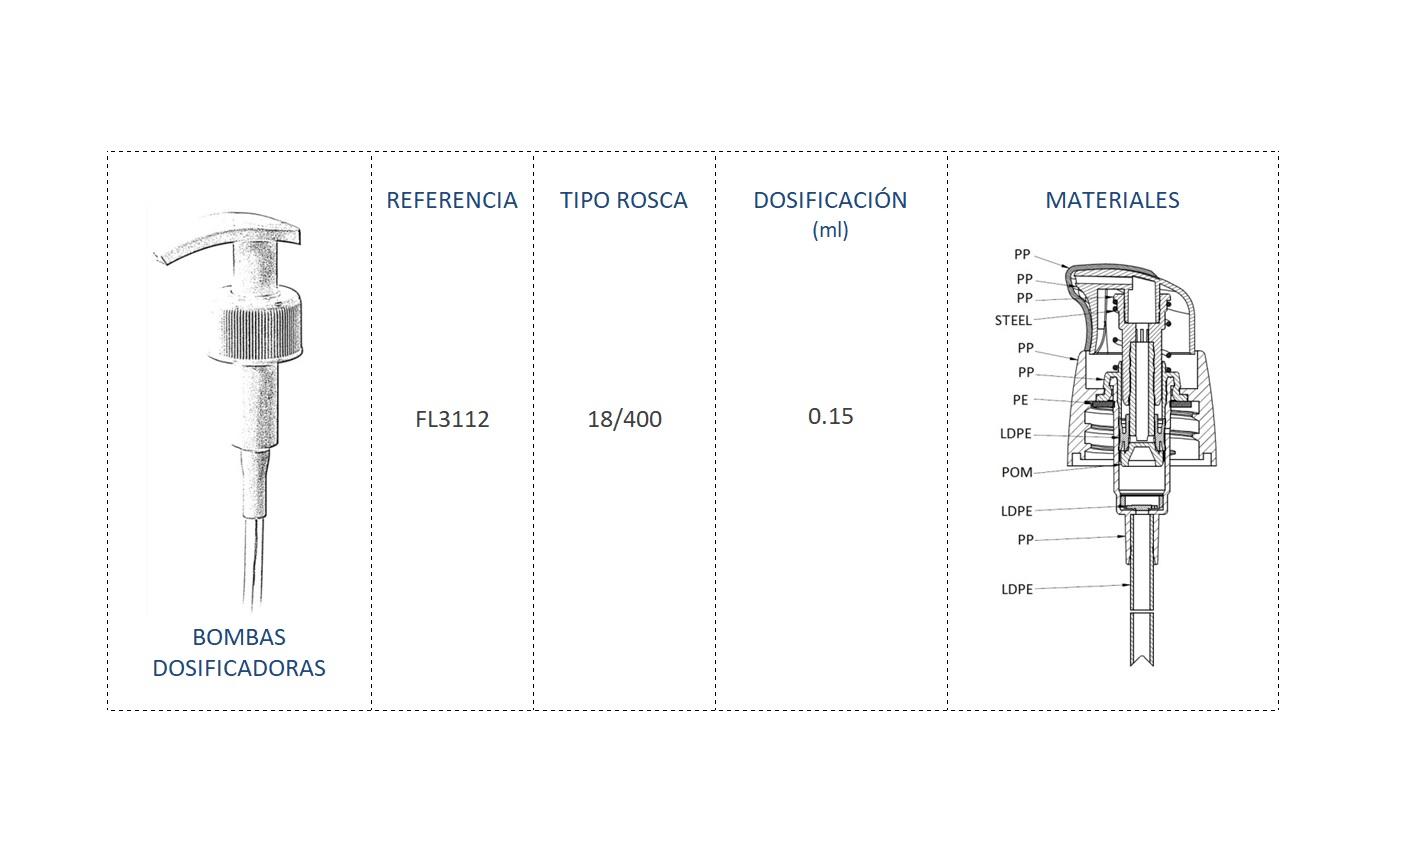 Cuadro de materiales bomba dosificadora FL3112 18-400